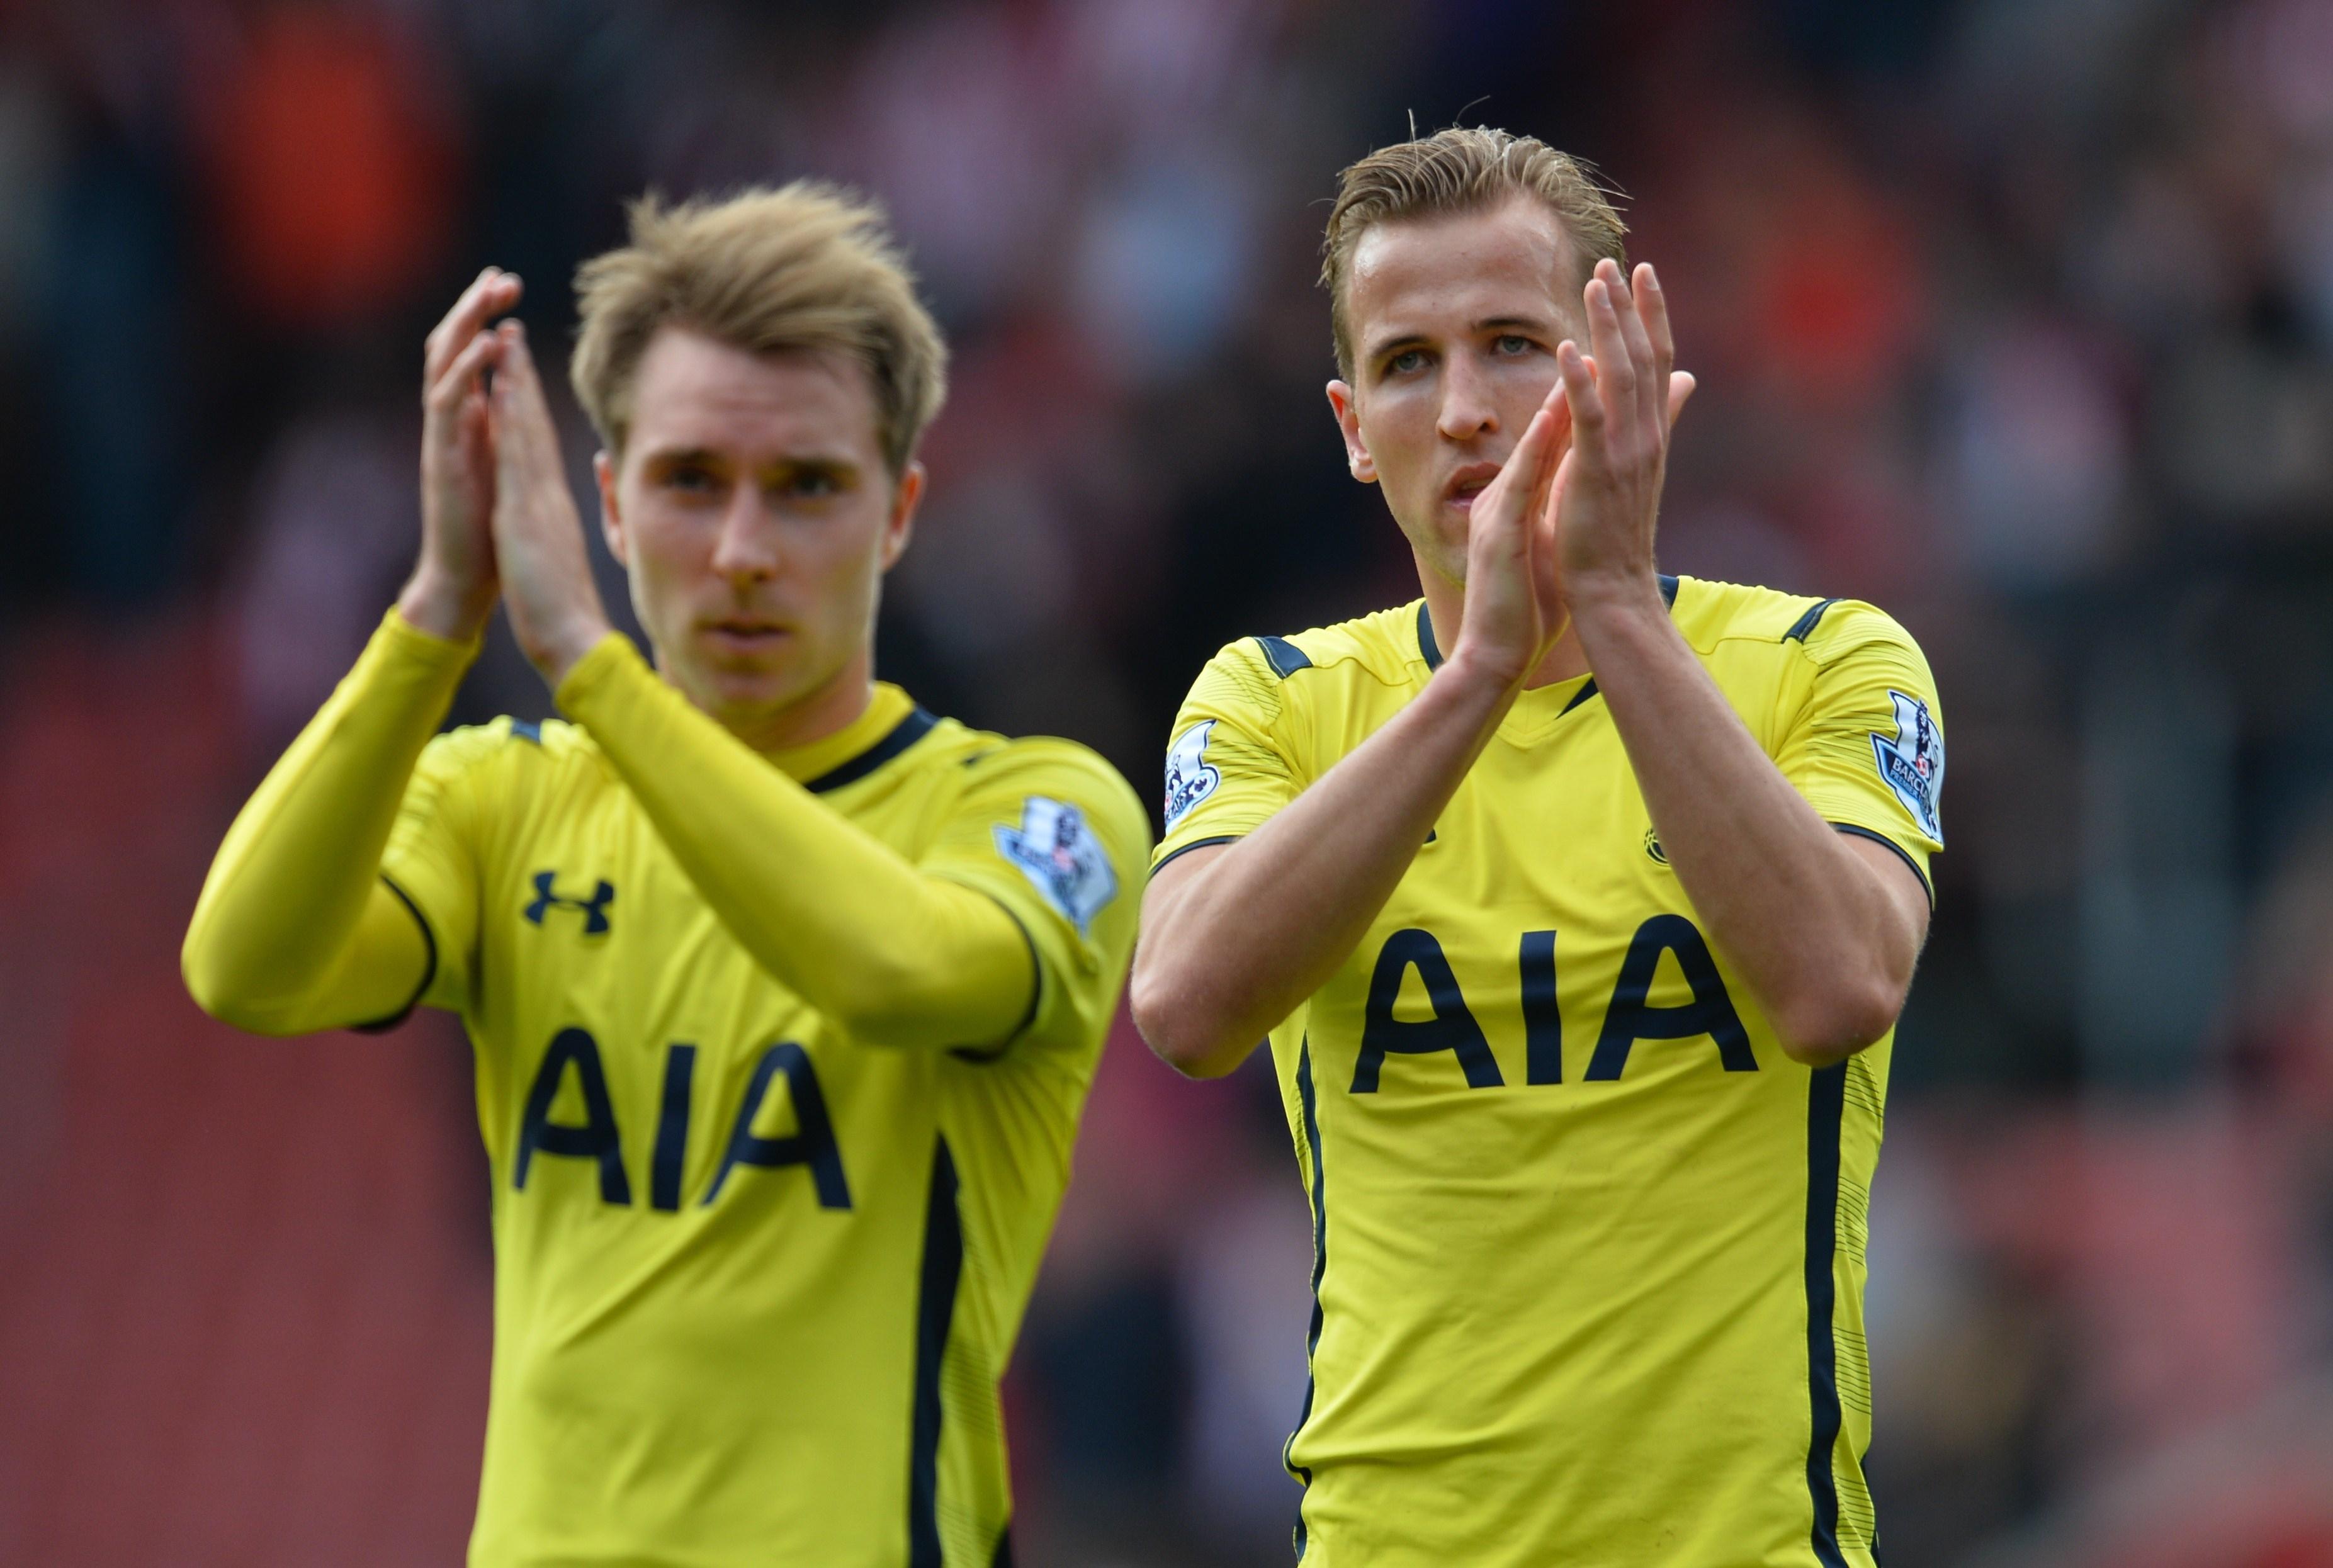 Spurs midfielder Eriksen reveals how he nearly joined Chelsea